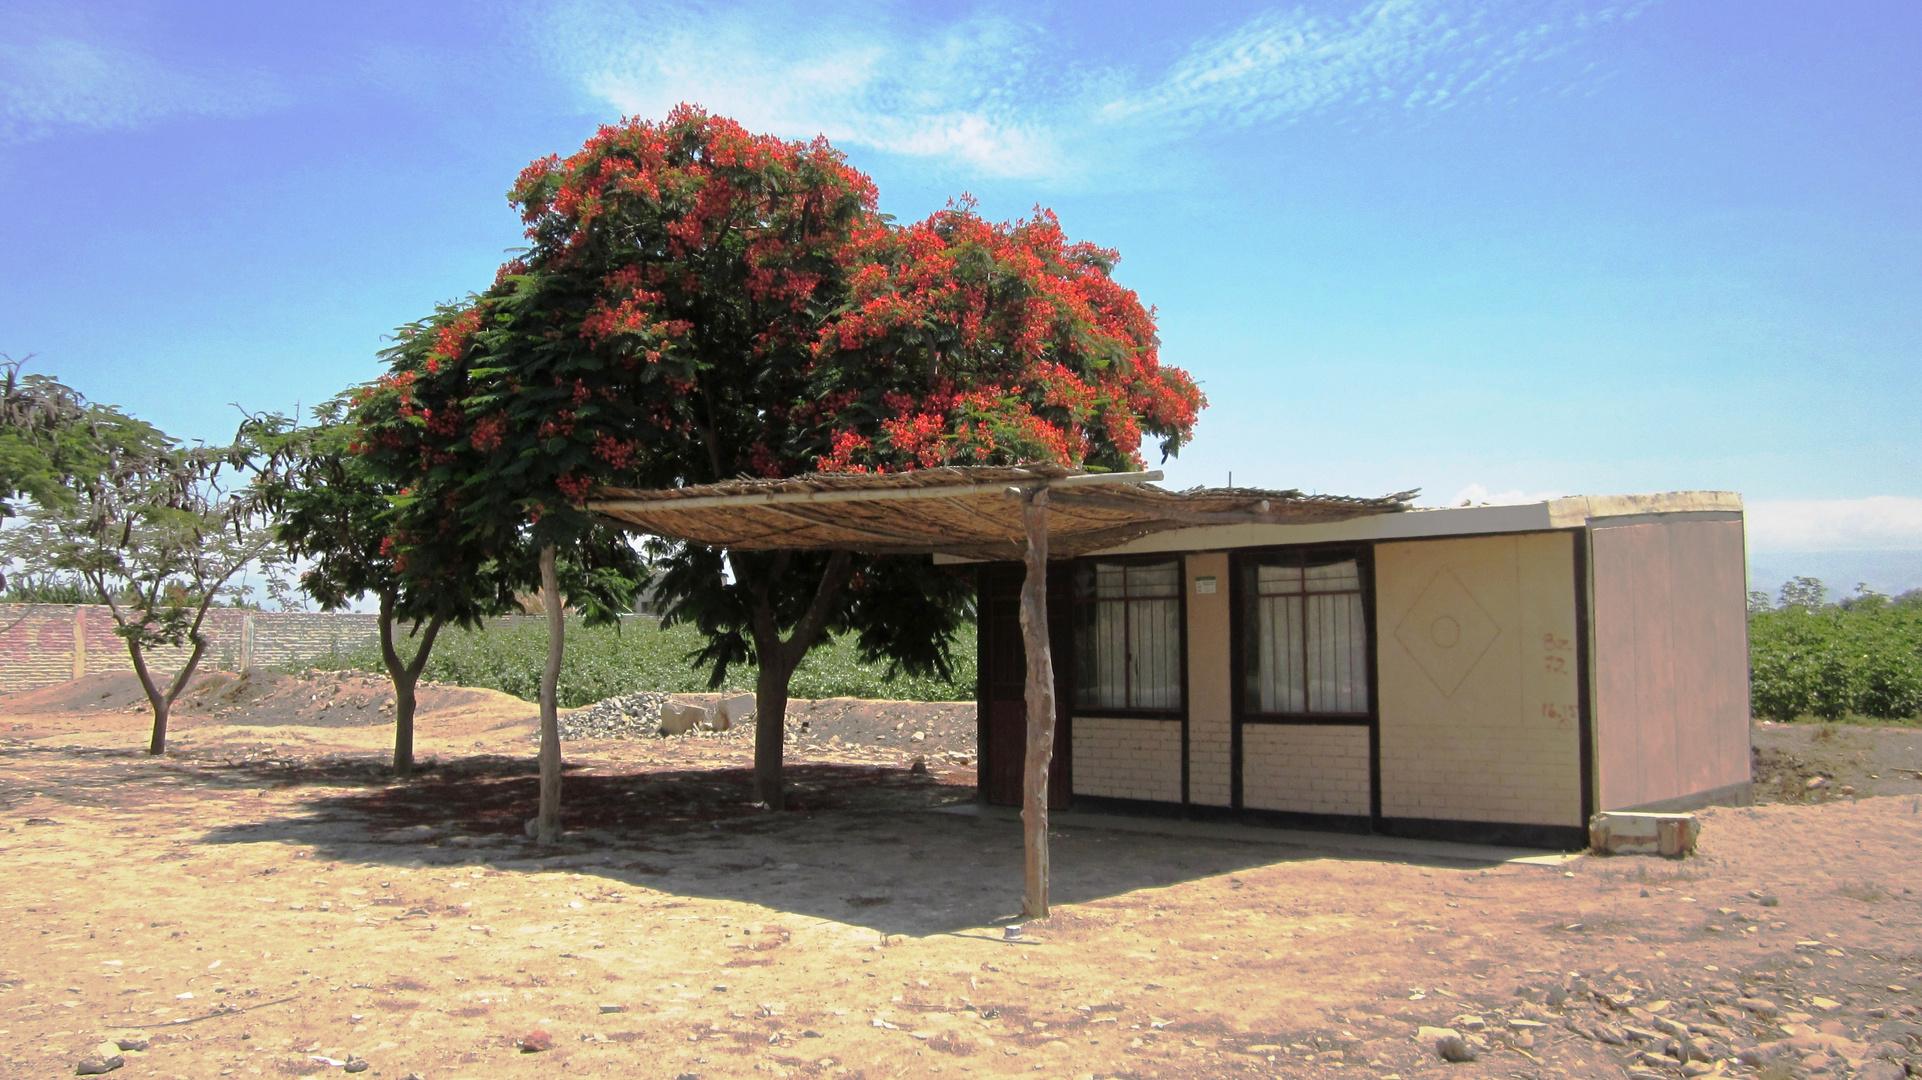 La casita rural